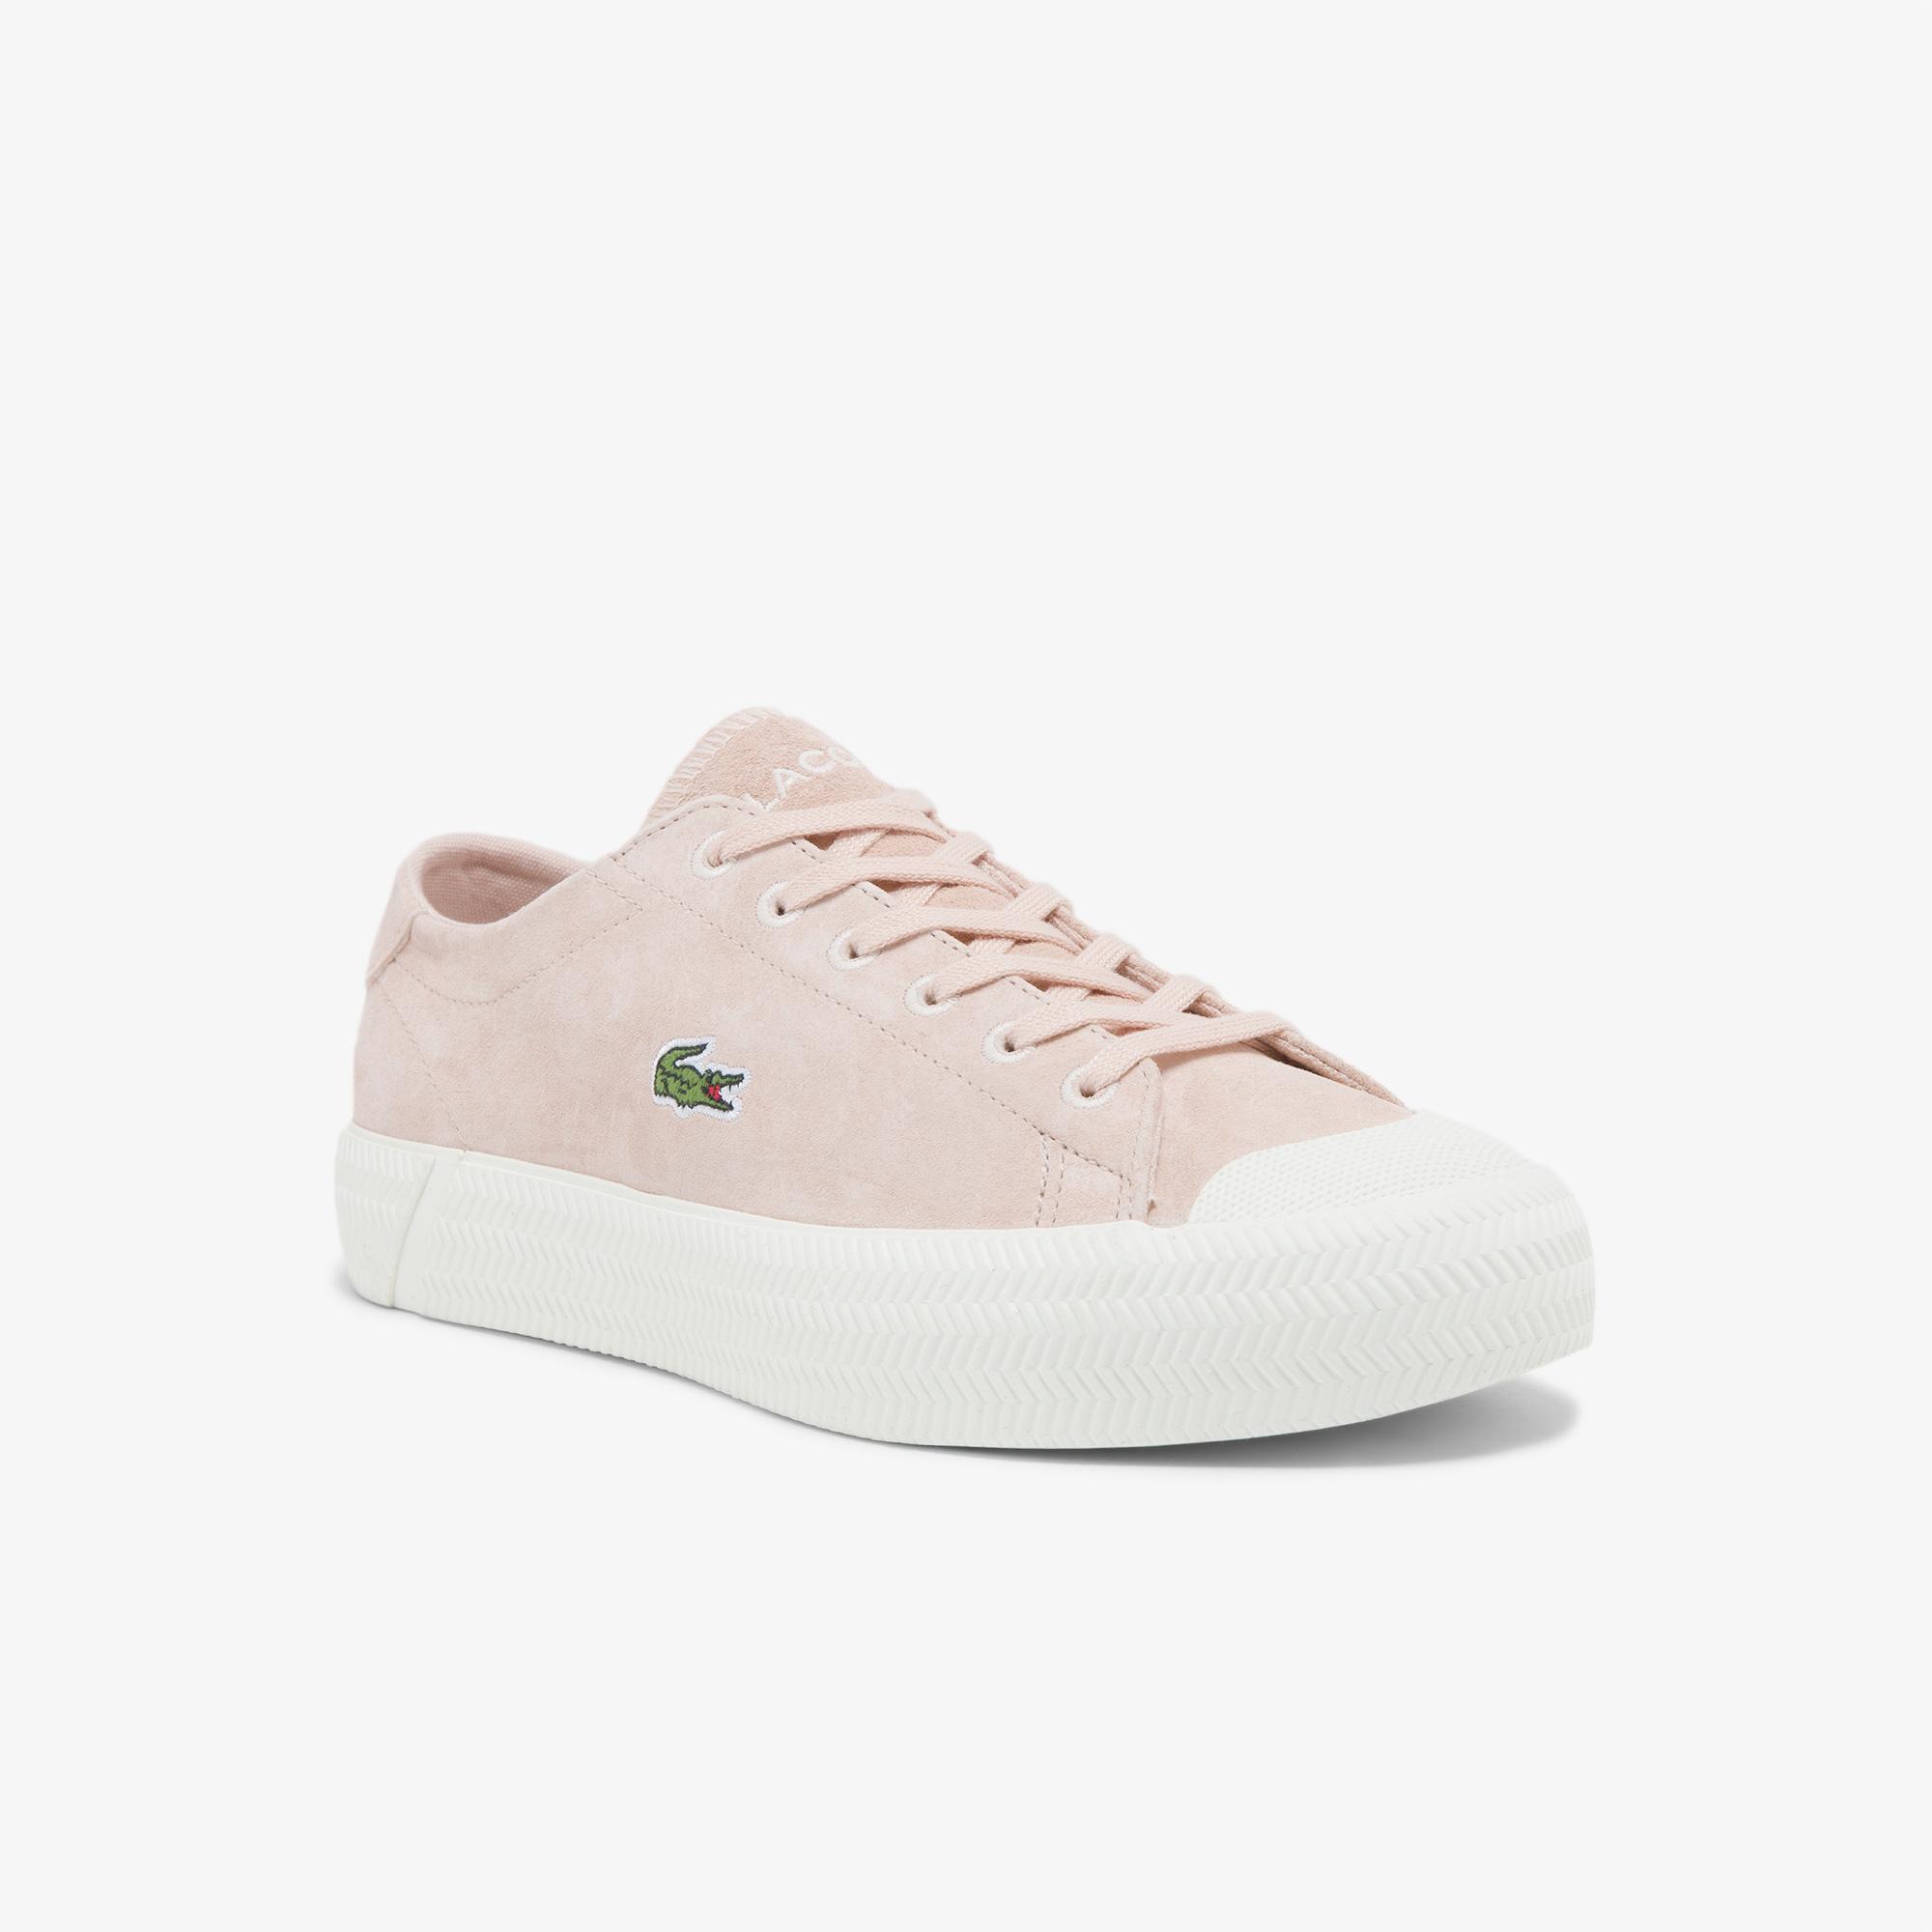 Lacoste Gripshot 0321 1 Cfa Kadın Deri Pembe - Beyaz Sneaker